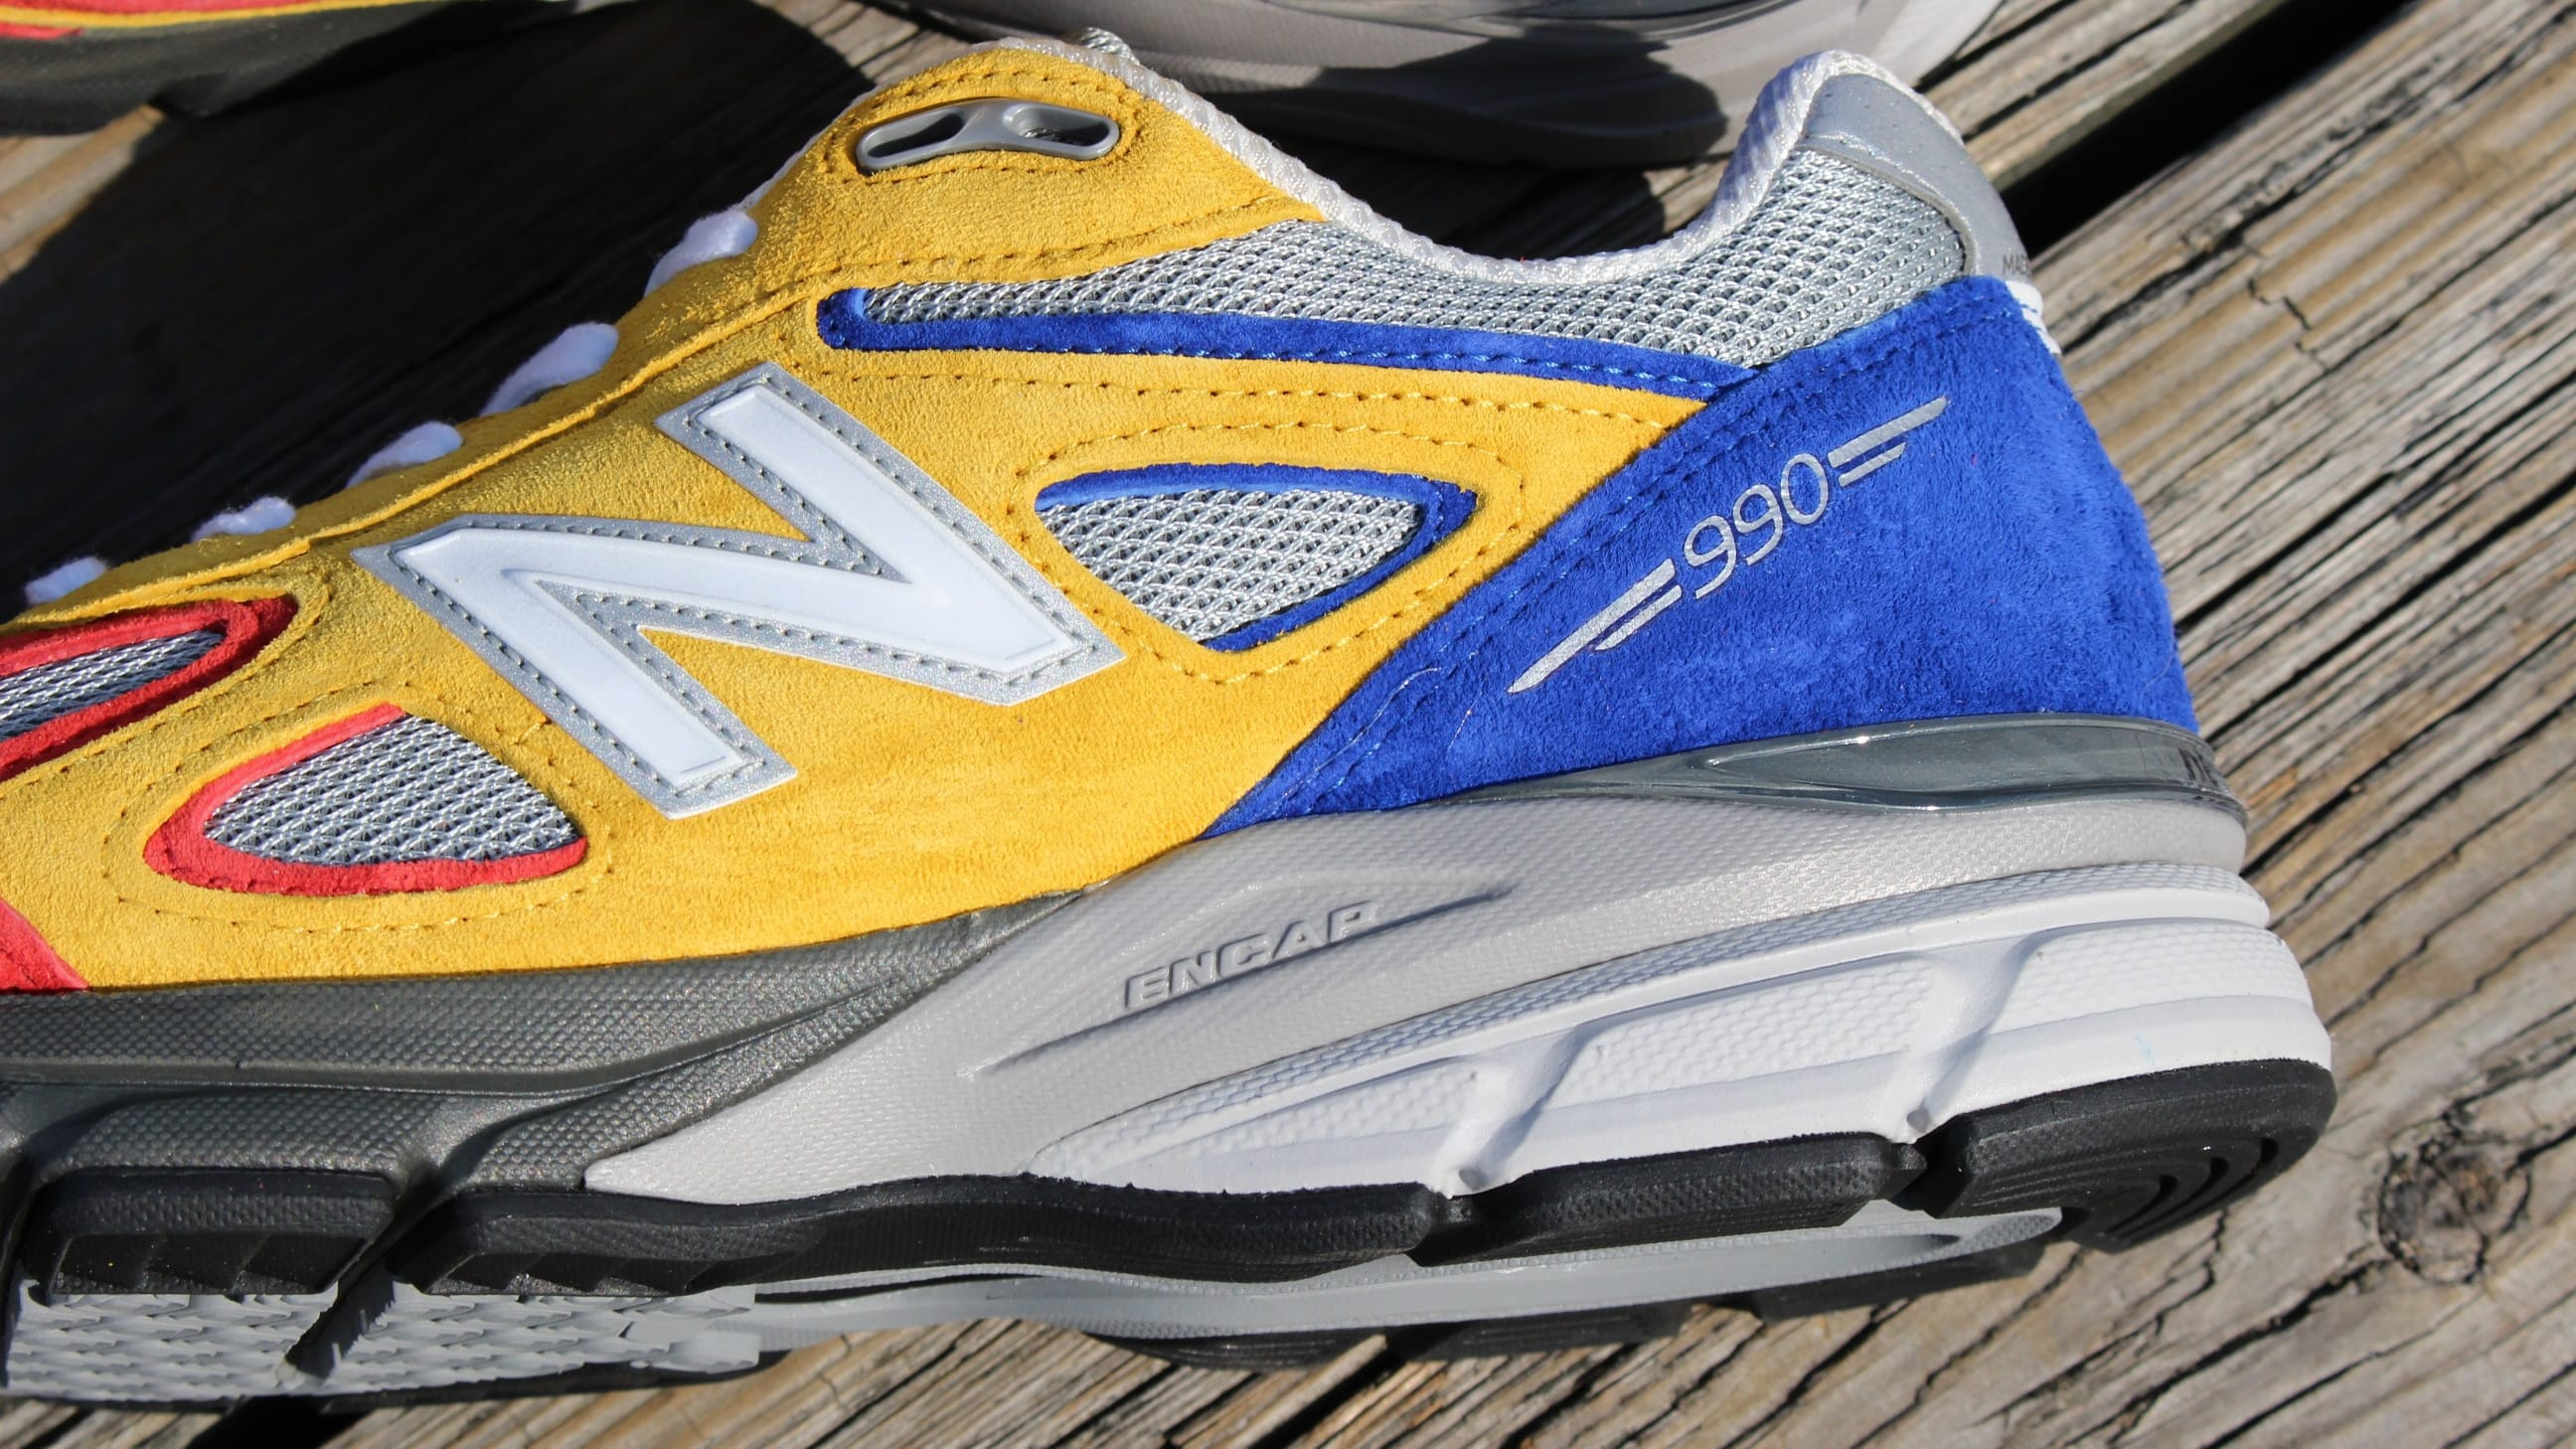 new style 164a9 c7db5 france 990 new balance shoe city ccd1c 60125